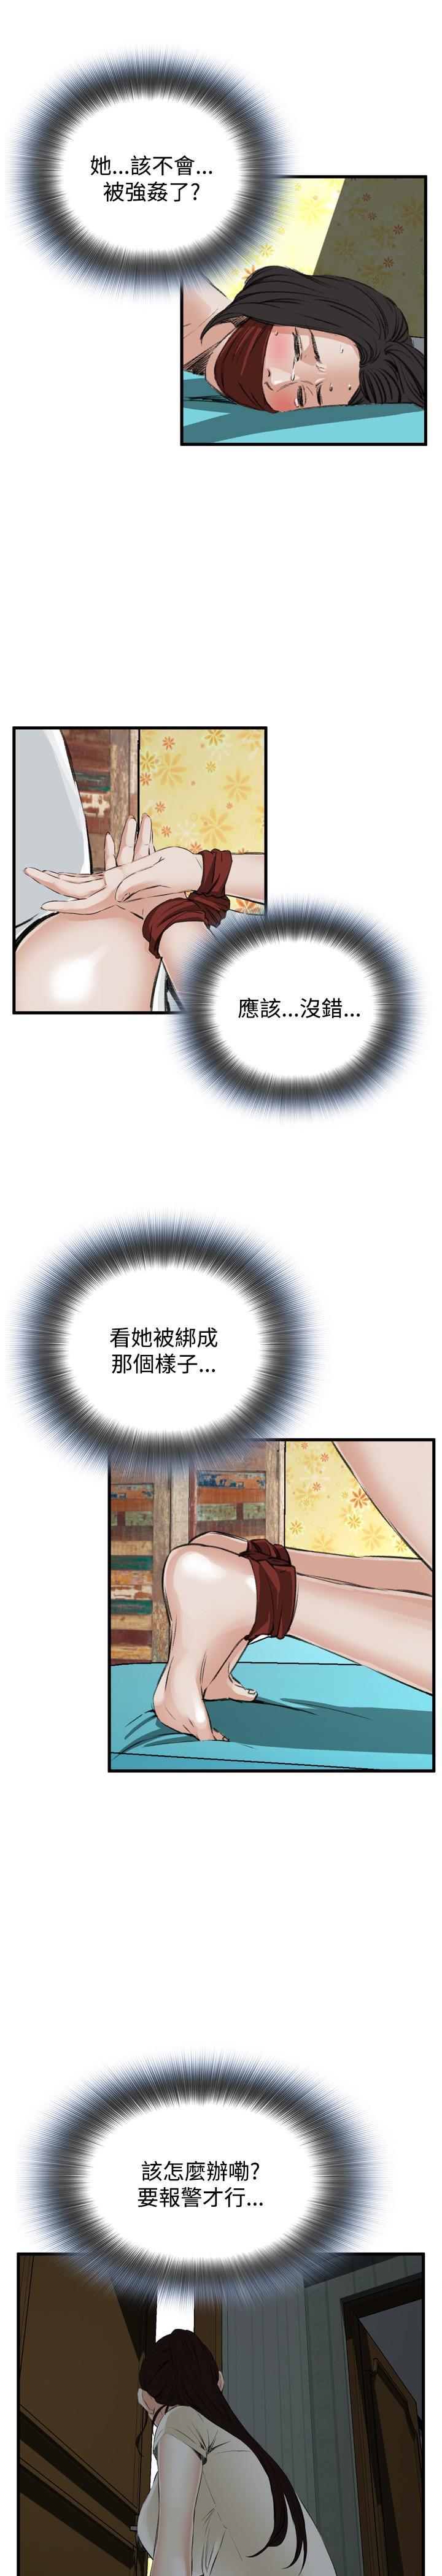 Take a Peek 偷窥 Ch.39~51 [Chinese]中文 163